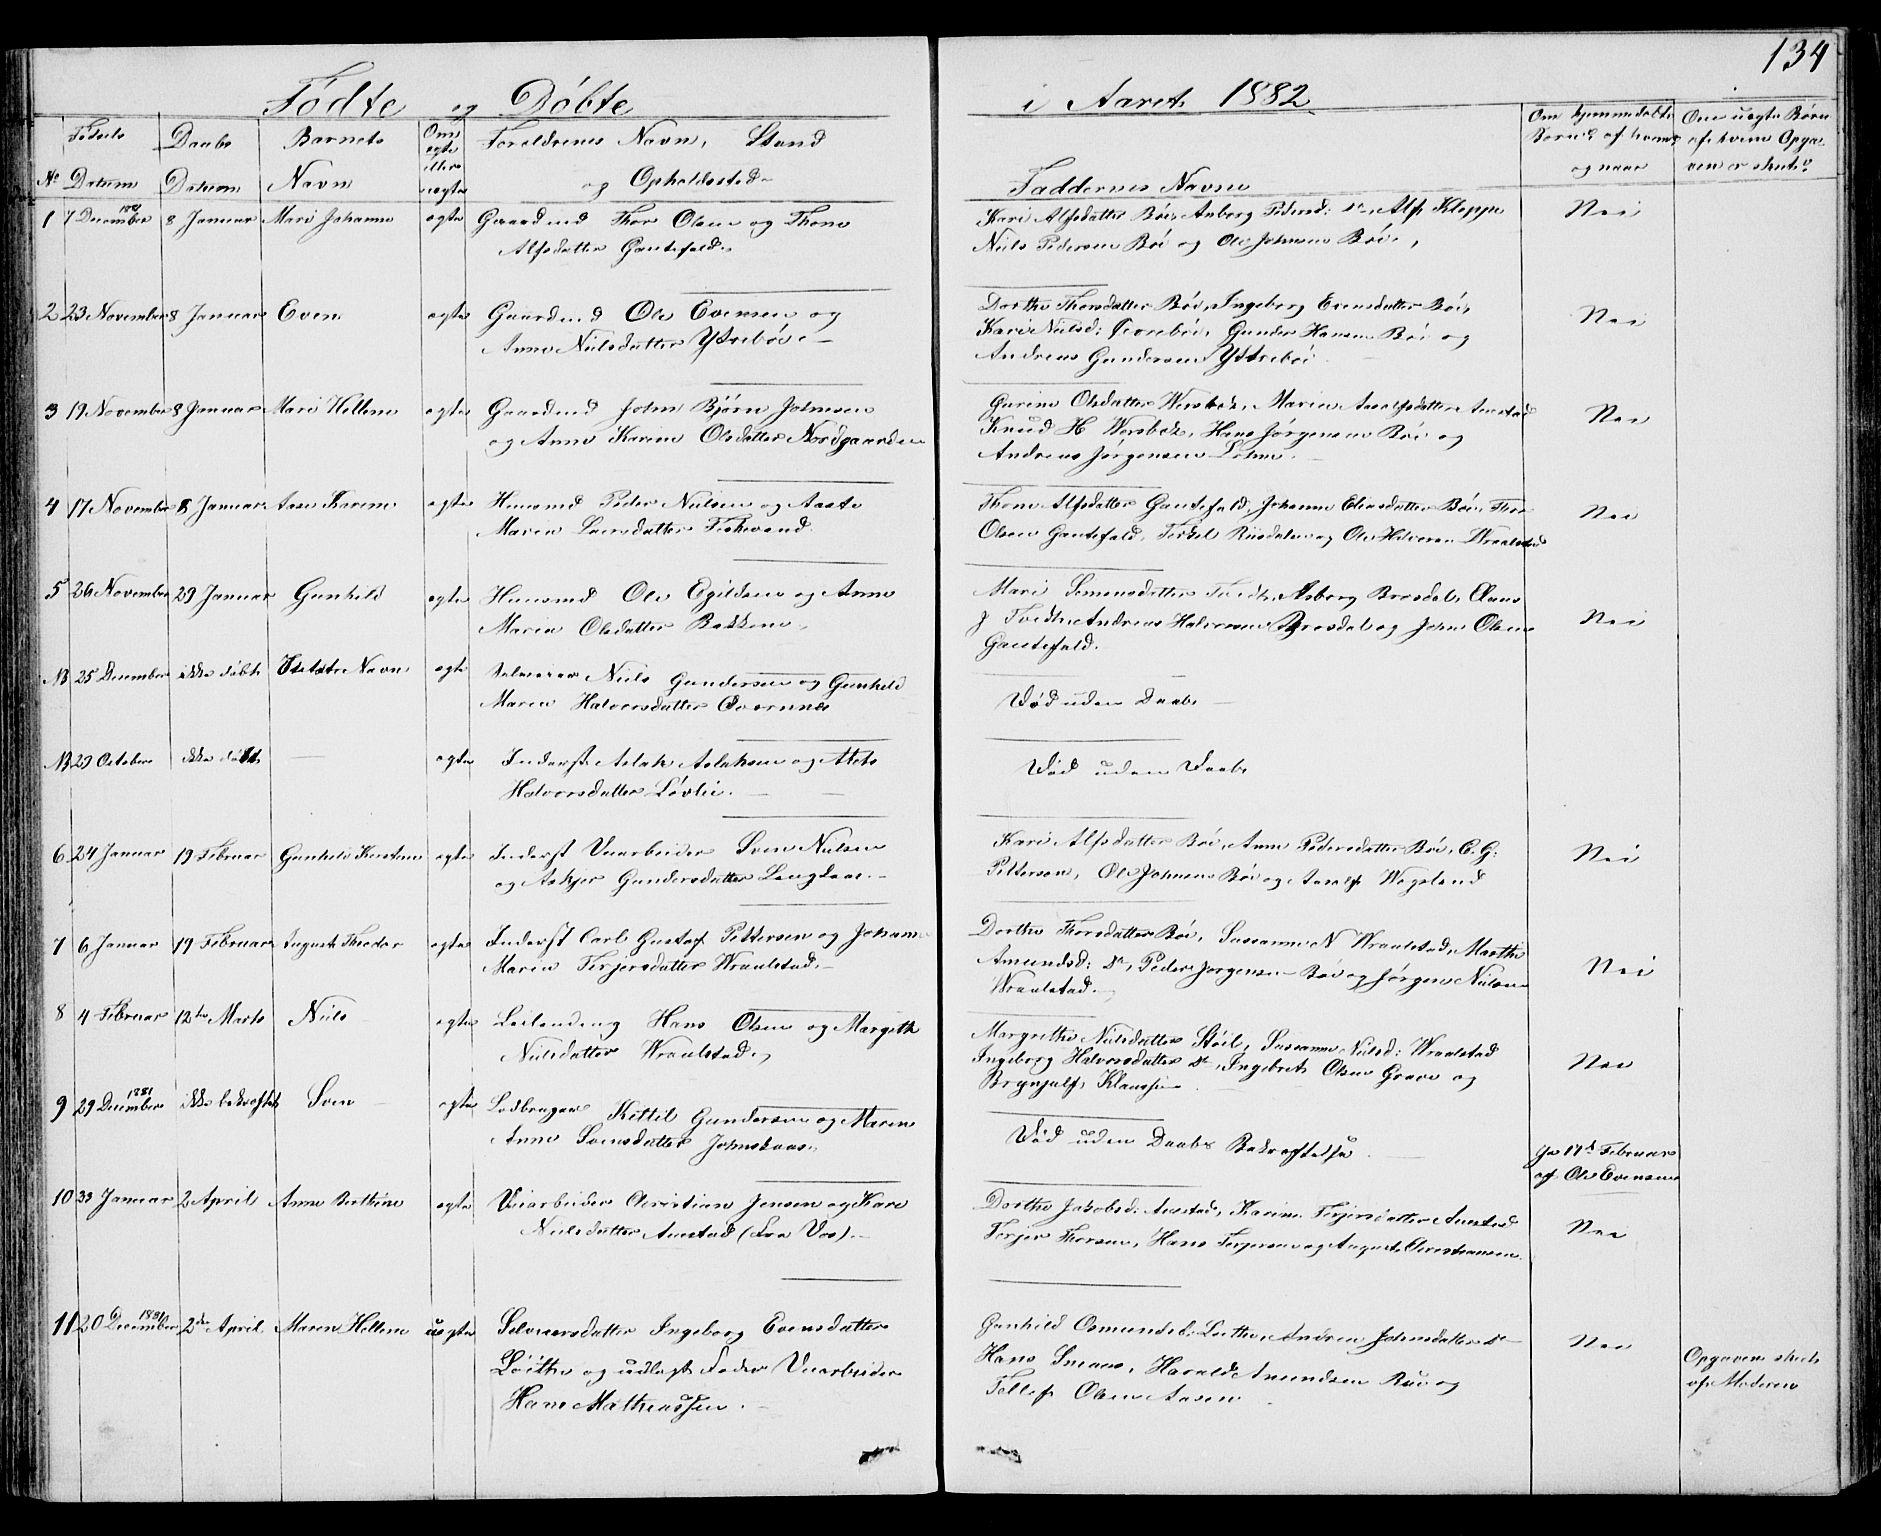 SAKO, Drangedal kirkebøker, G/Gb/L0001: Klokkerbok nr. II 1, 1856-1894, s. 134